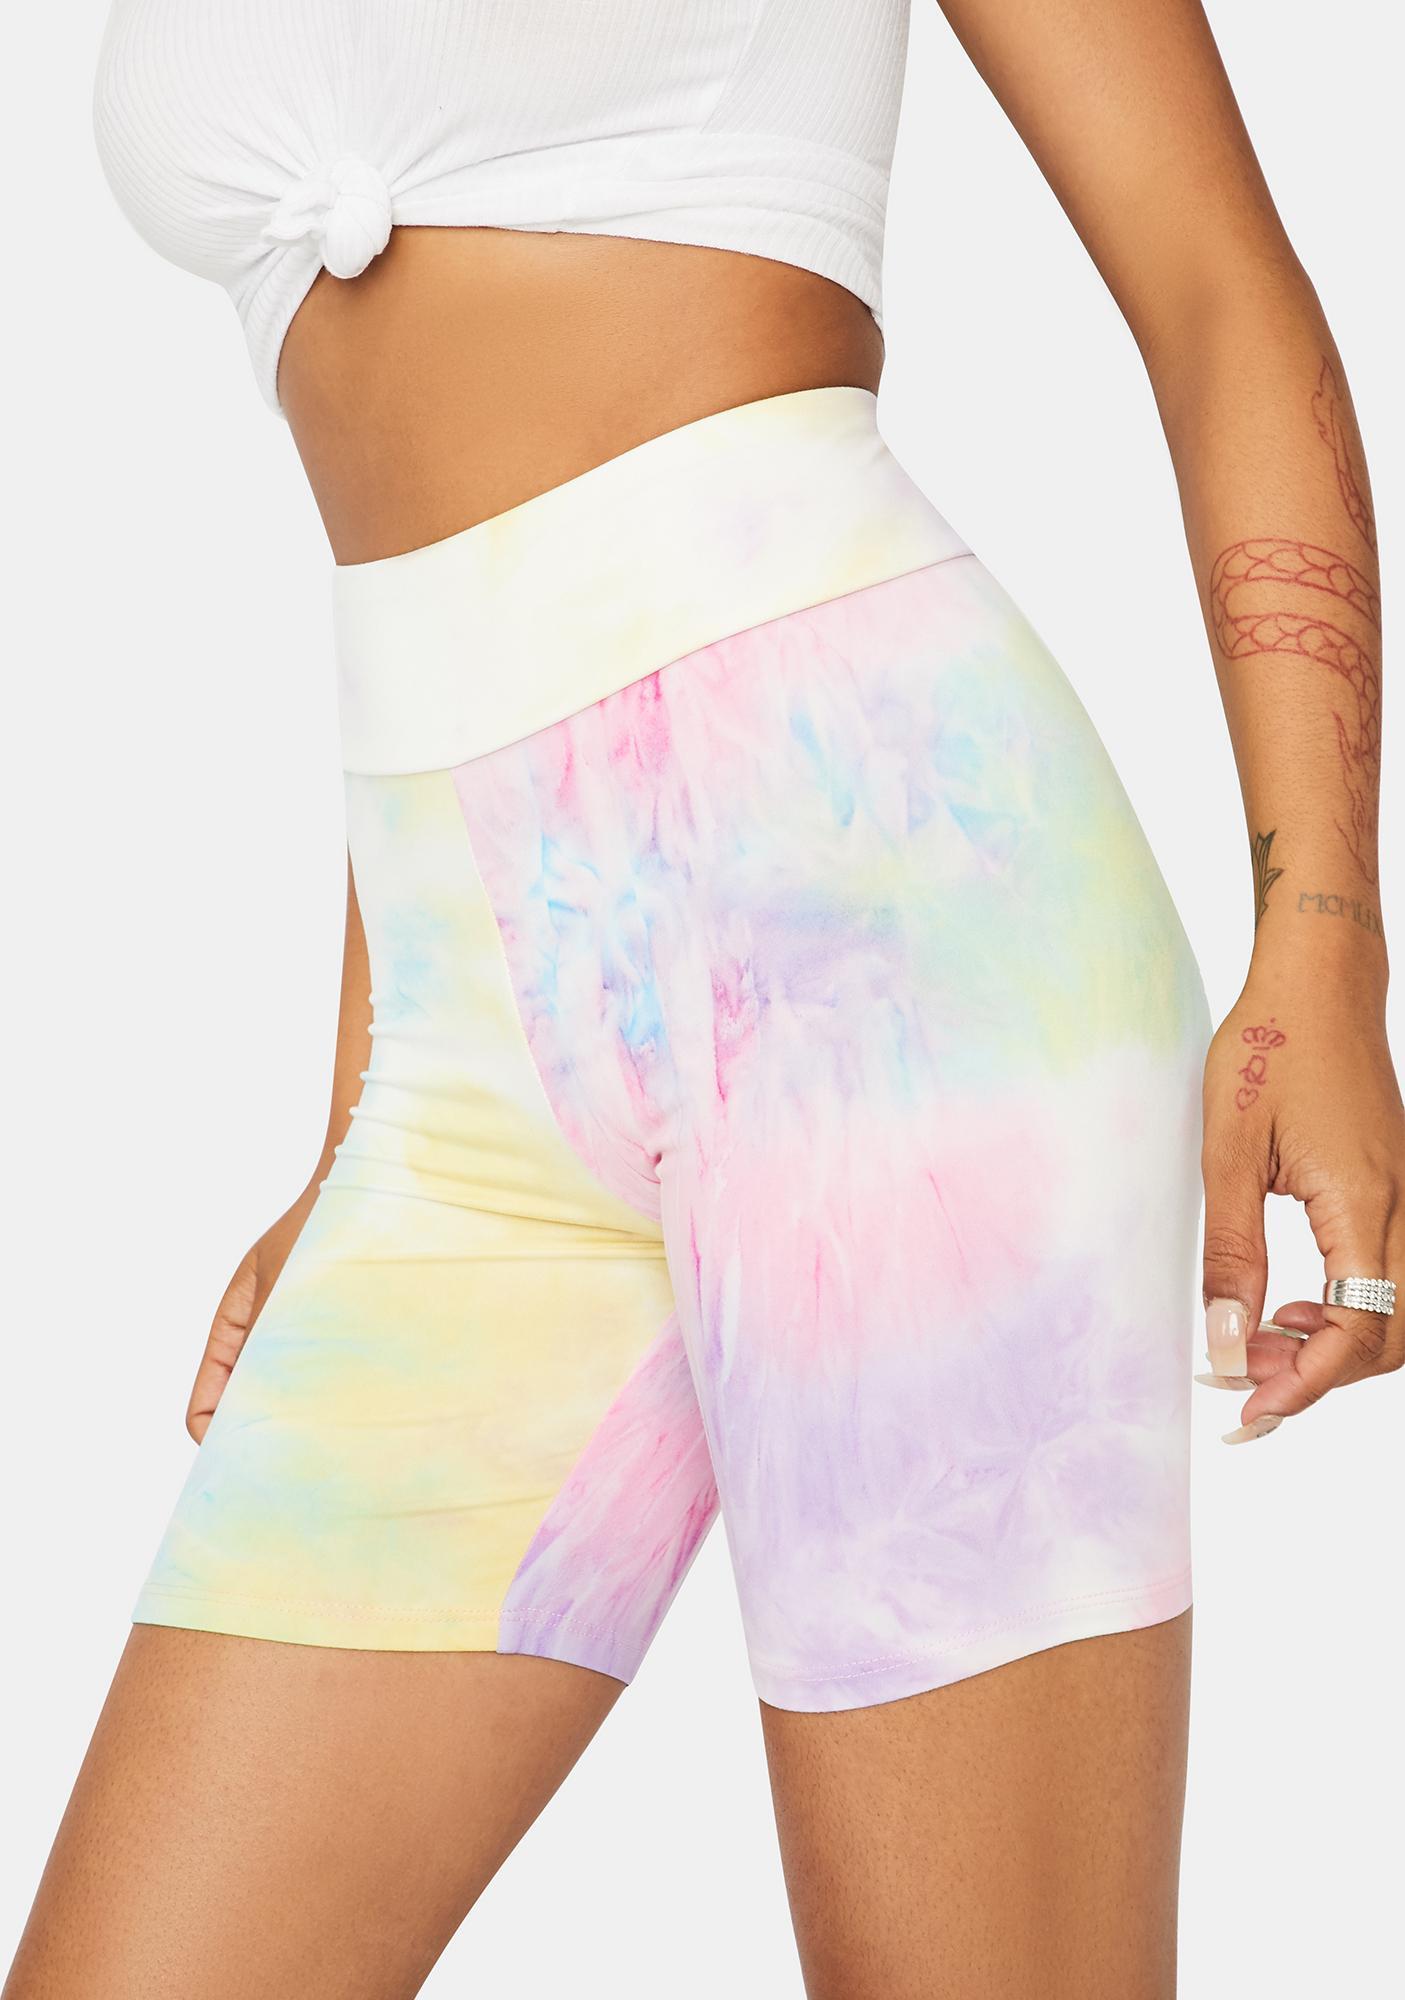 Sherbet Chiller Vibes Tie Dye Biker Shorts